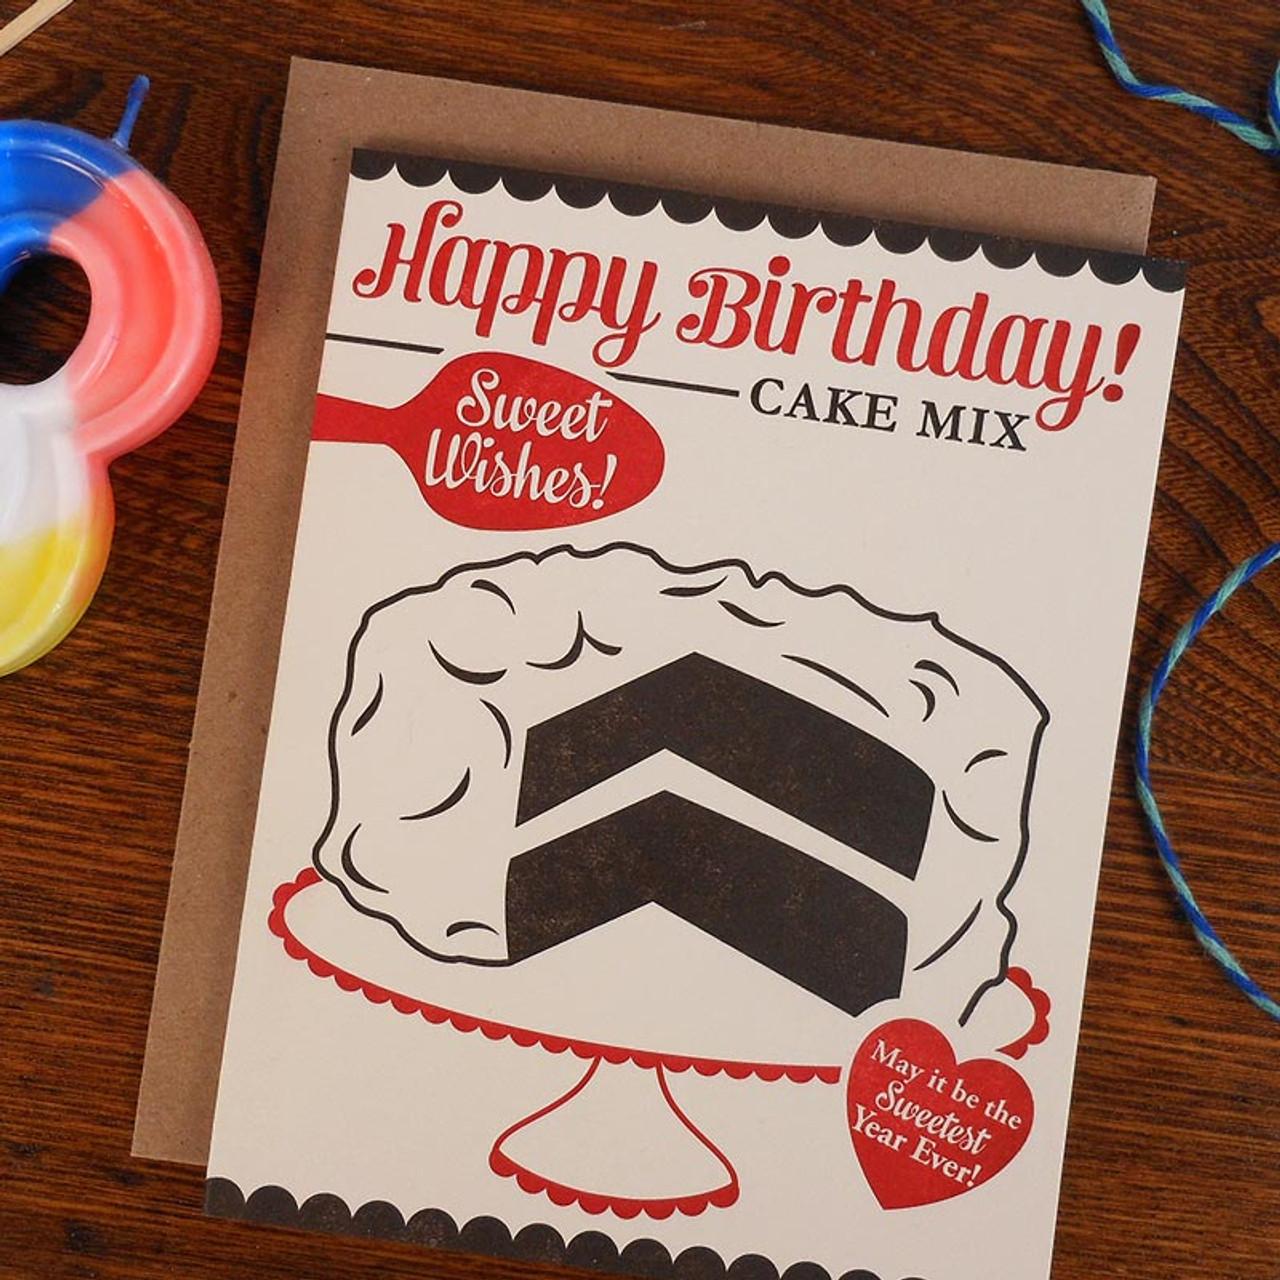 Say Happy Birthday with a Retro Cake Card